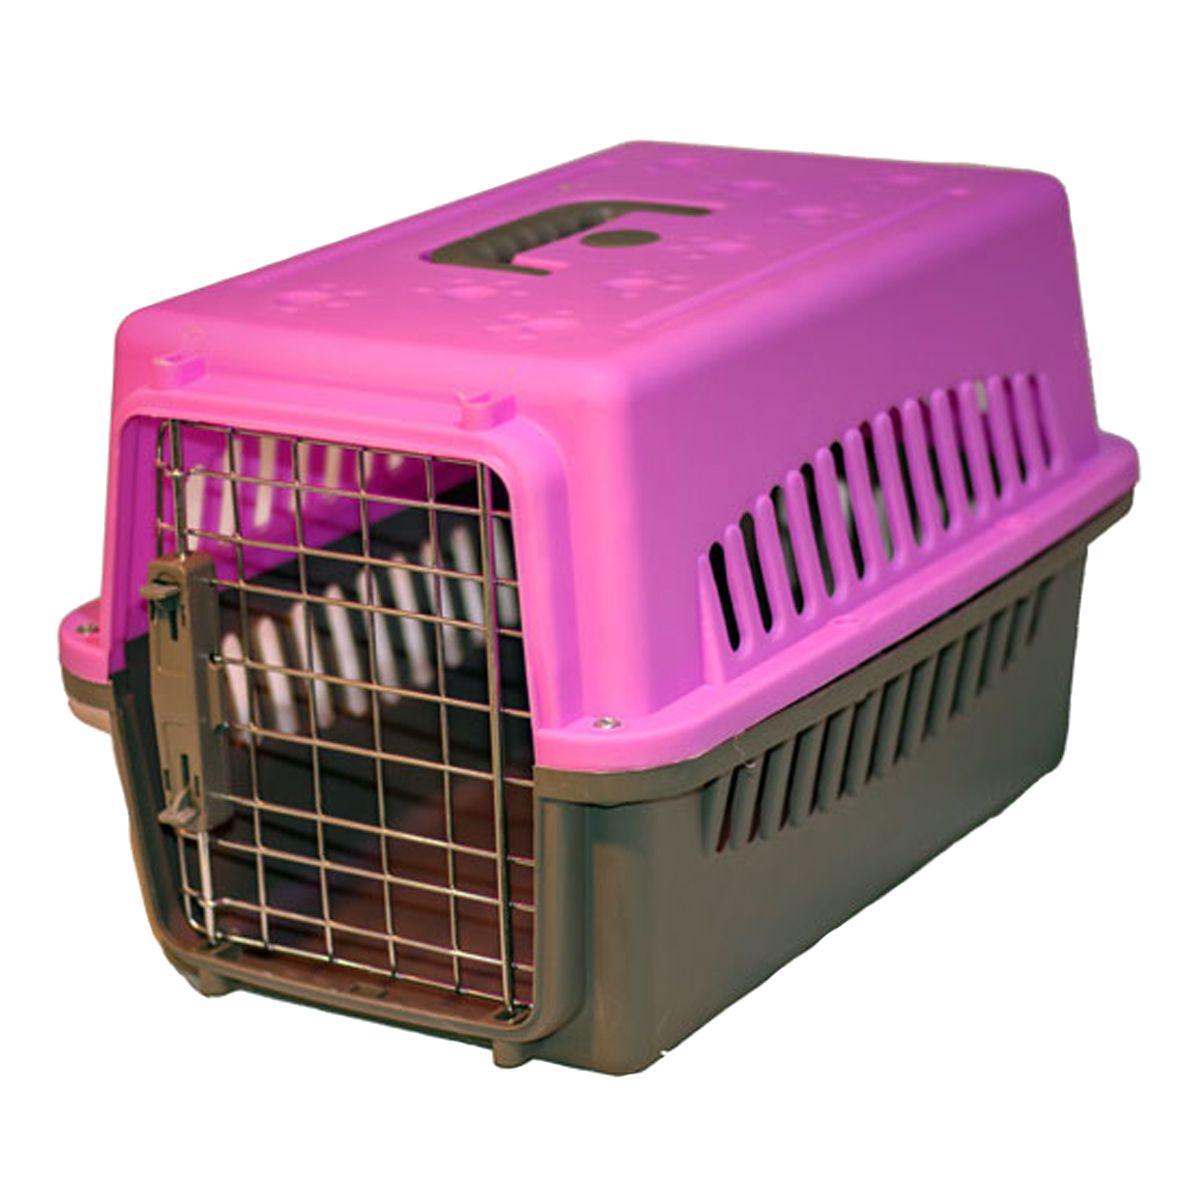 باکس حمل حیوانات خانگی مدل هاچیکو کد 01